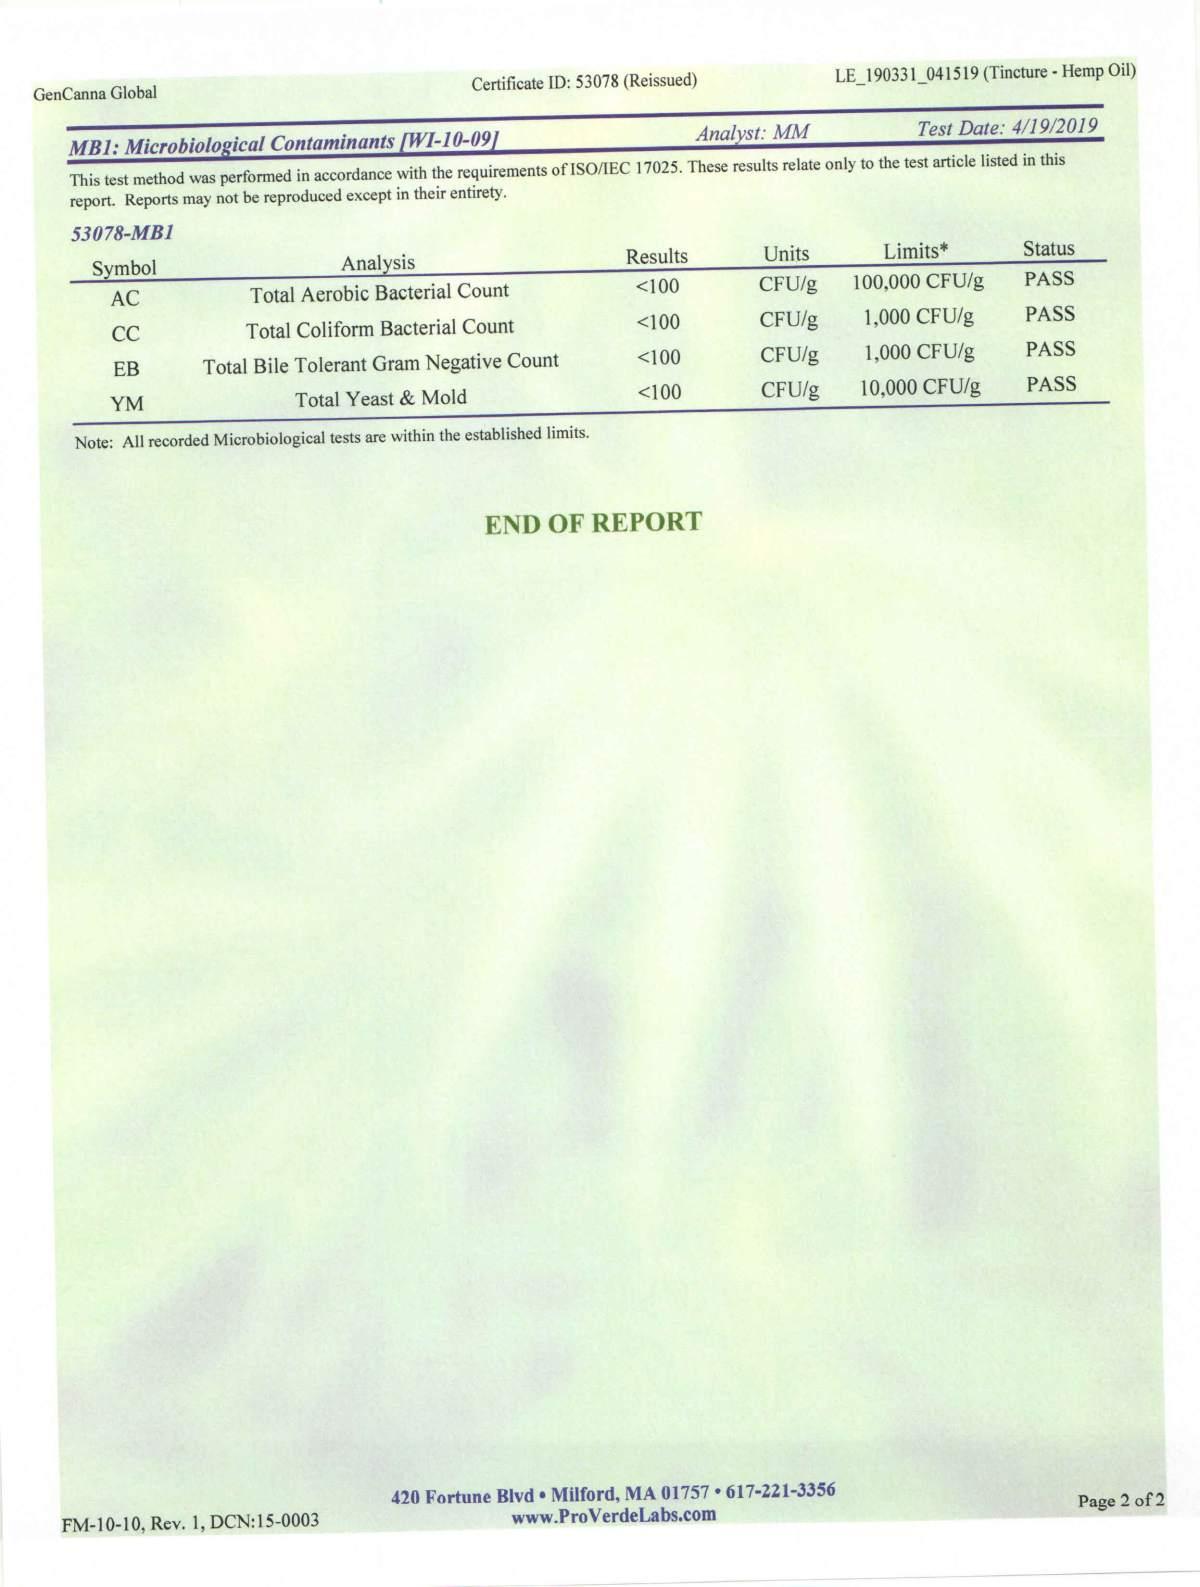 Full Spectrum CBD Oil 2nd page